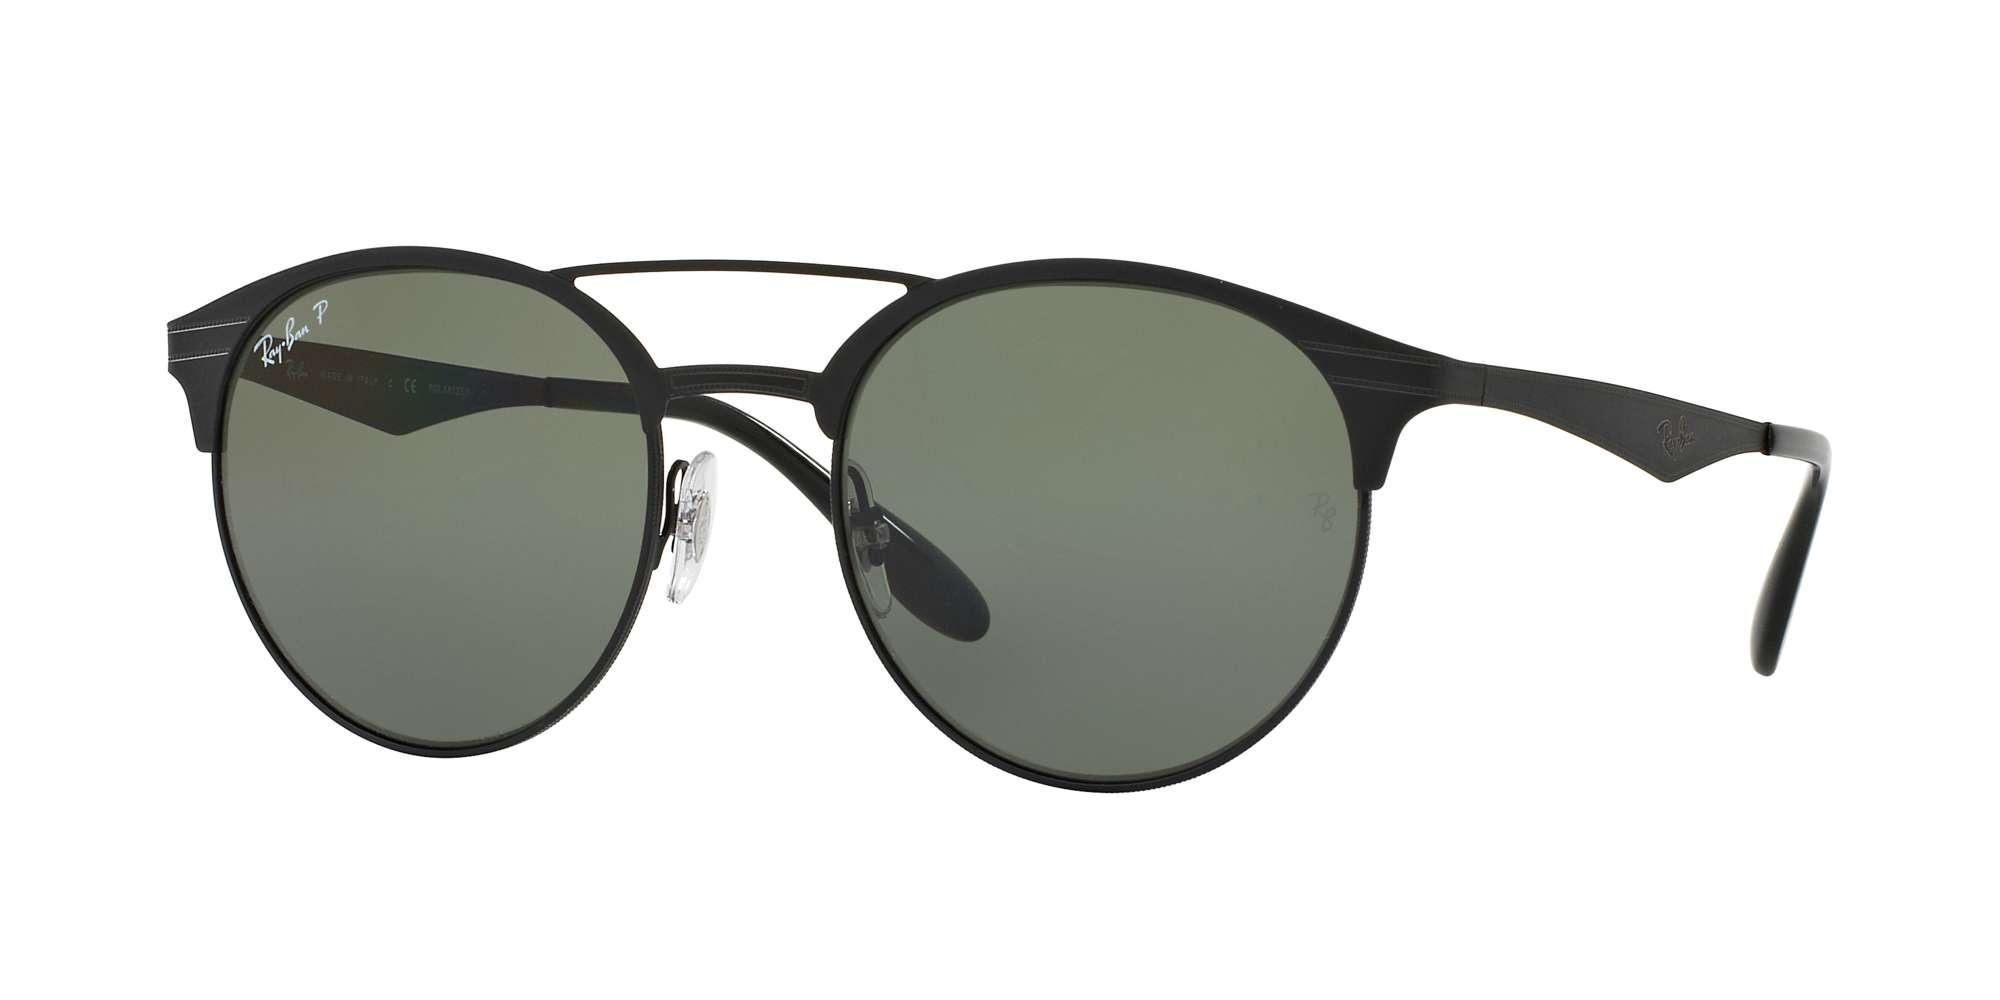 SHINY BLACK/TOP MATTE BL / POLAR GREEN lenses